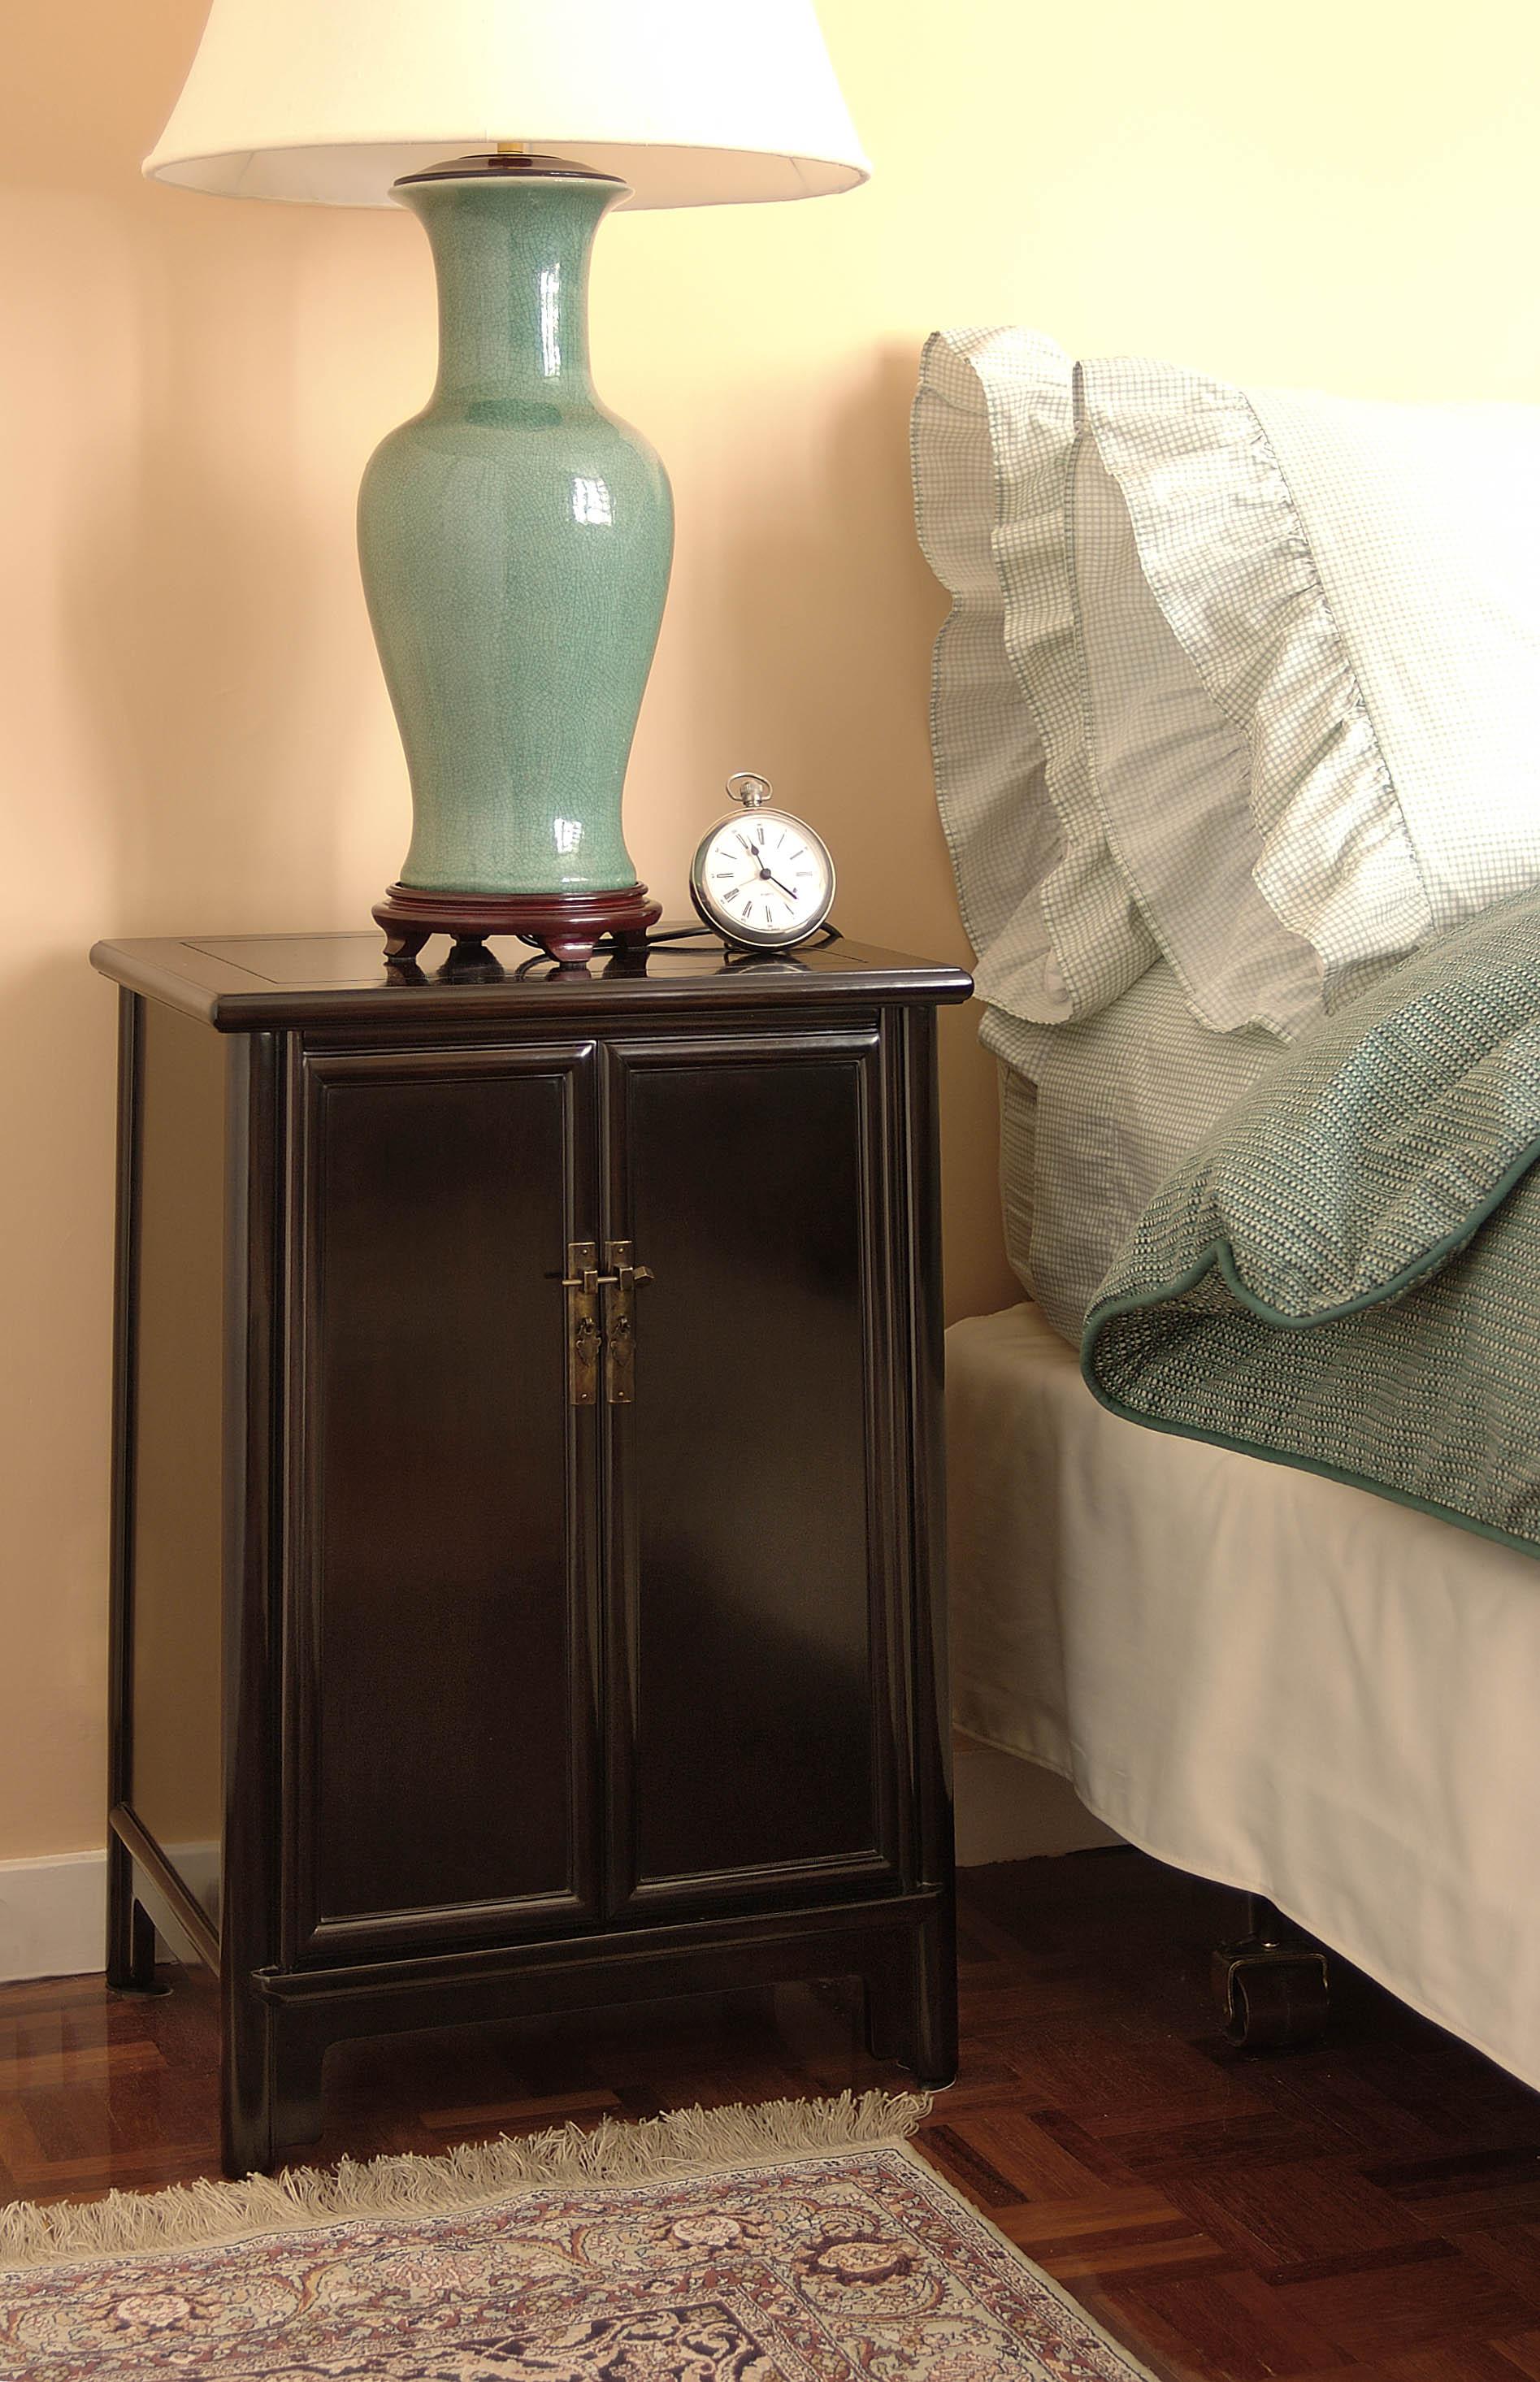 ....chinese ming style furniture : cabinet..中式明式家具 : 小柜....